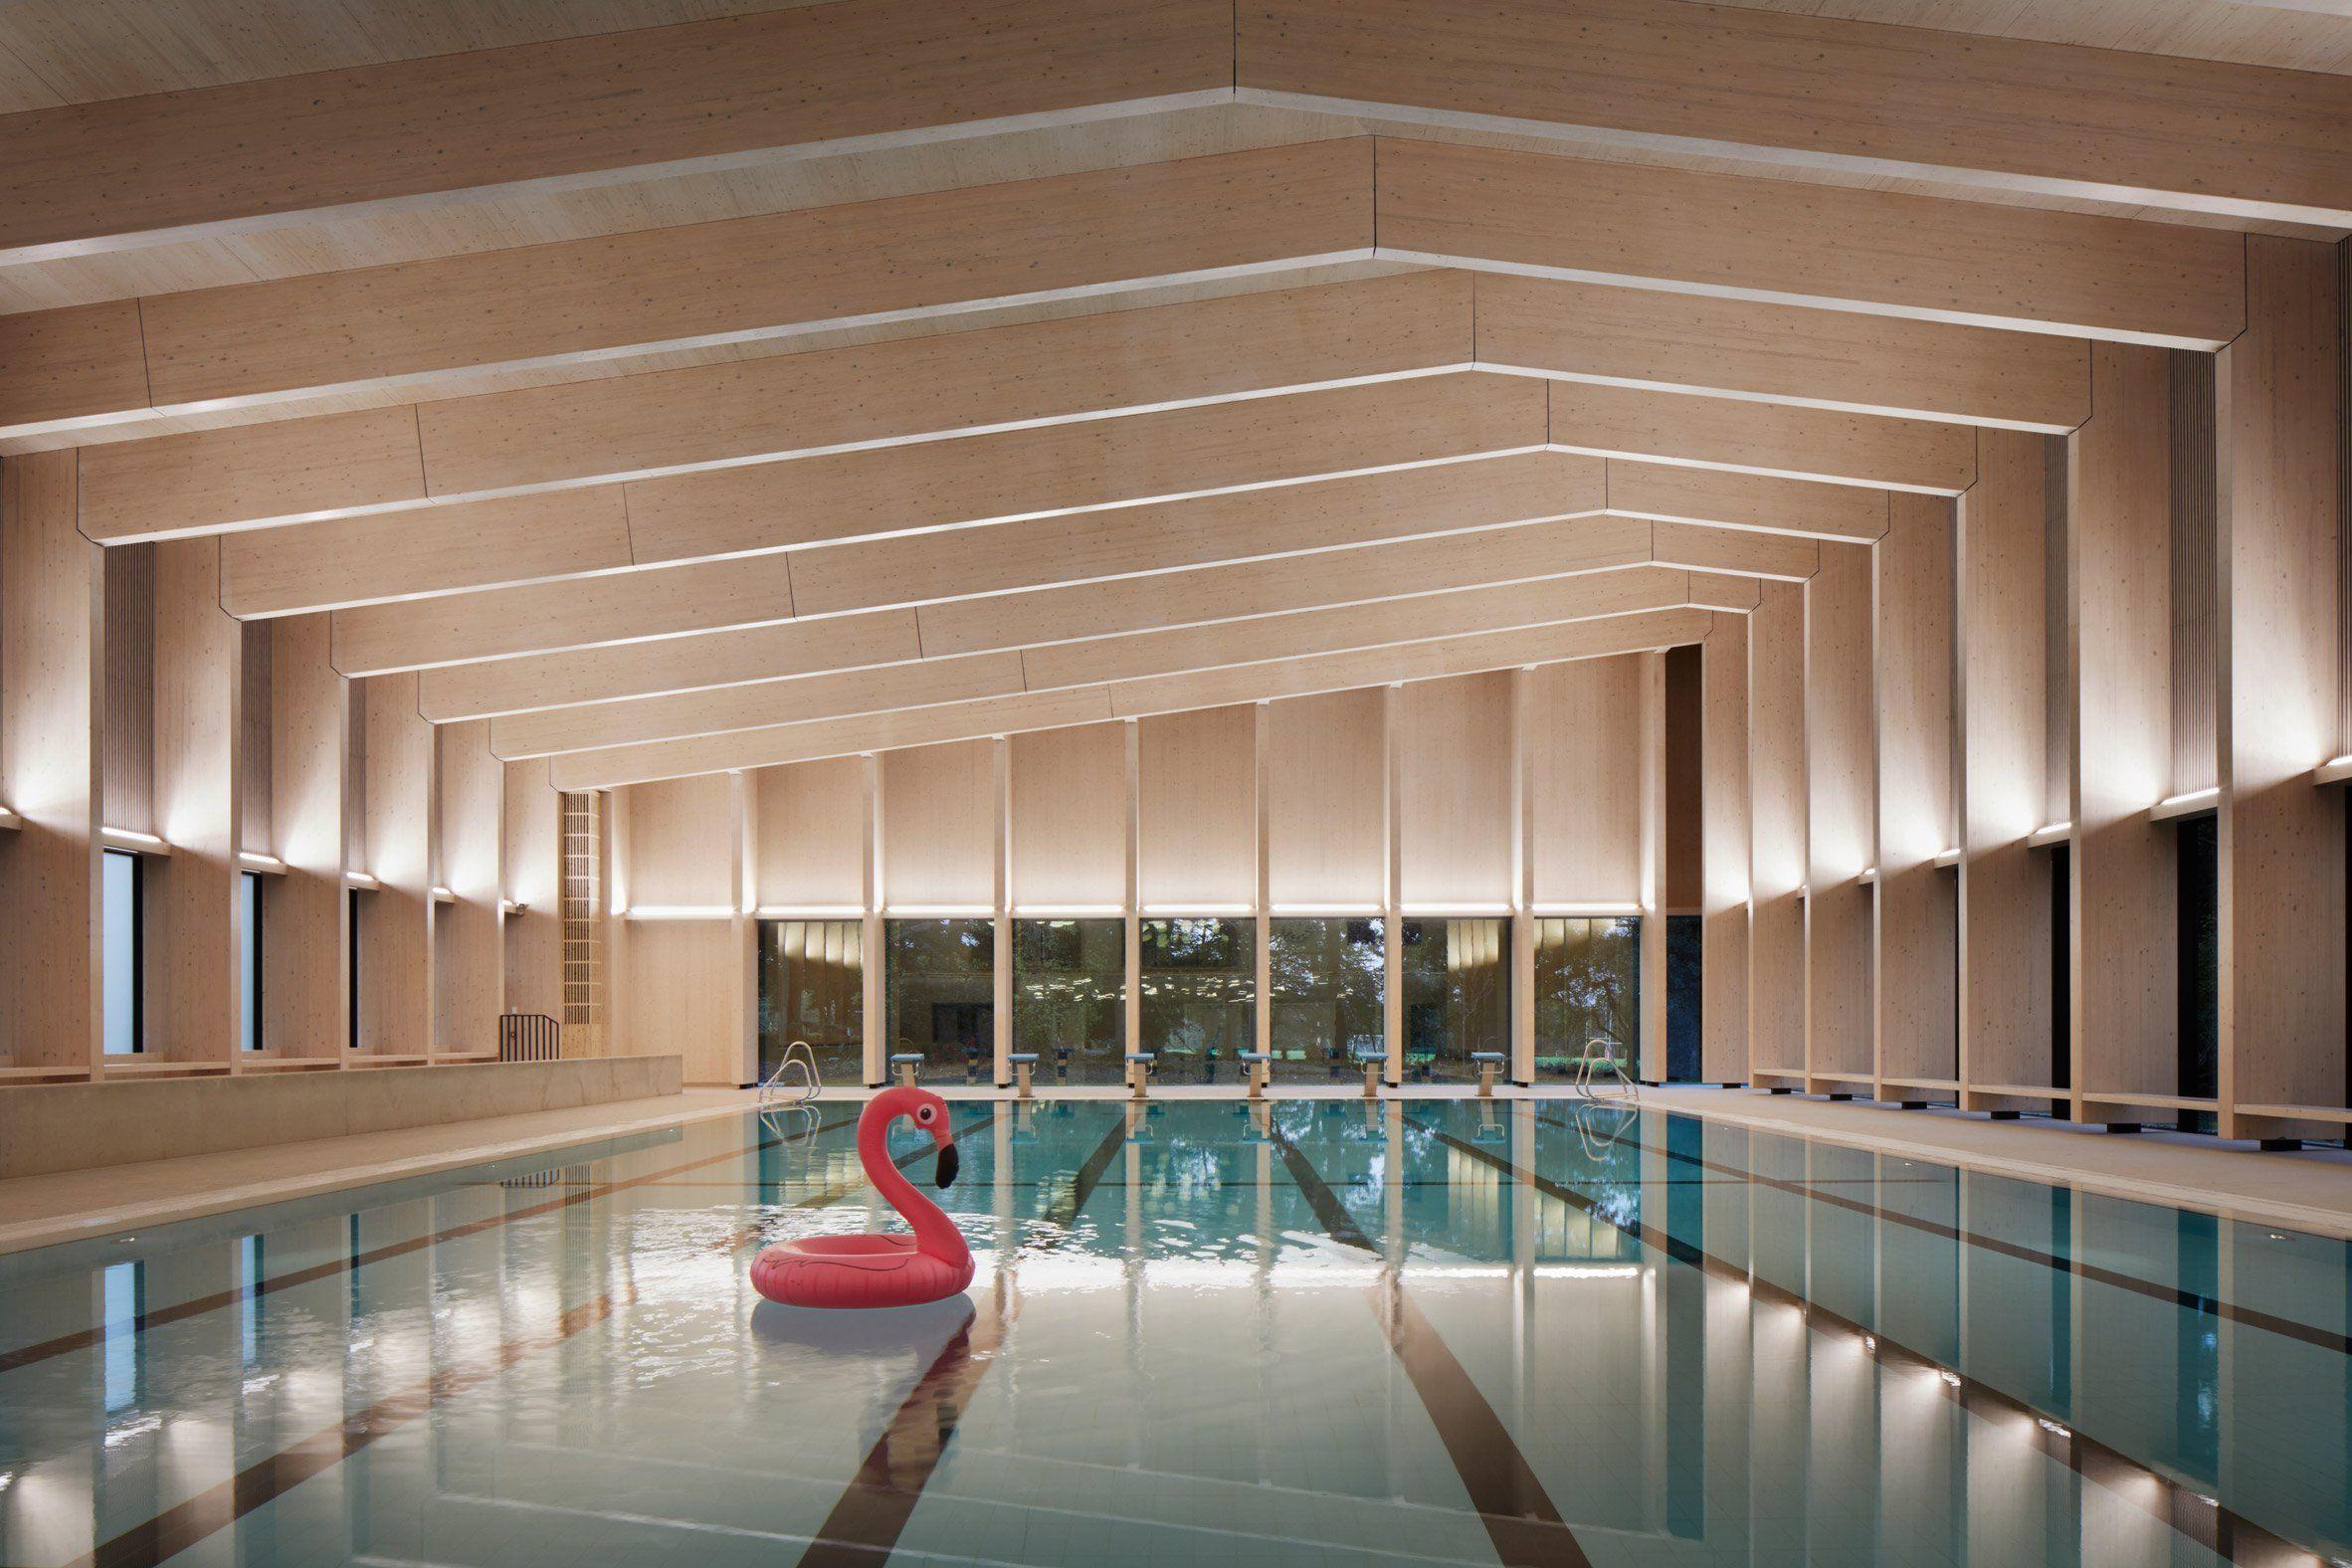 HawkinsBrown uses engineered wood to build school swimming pool ...